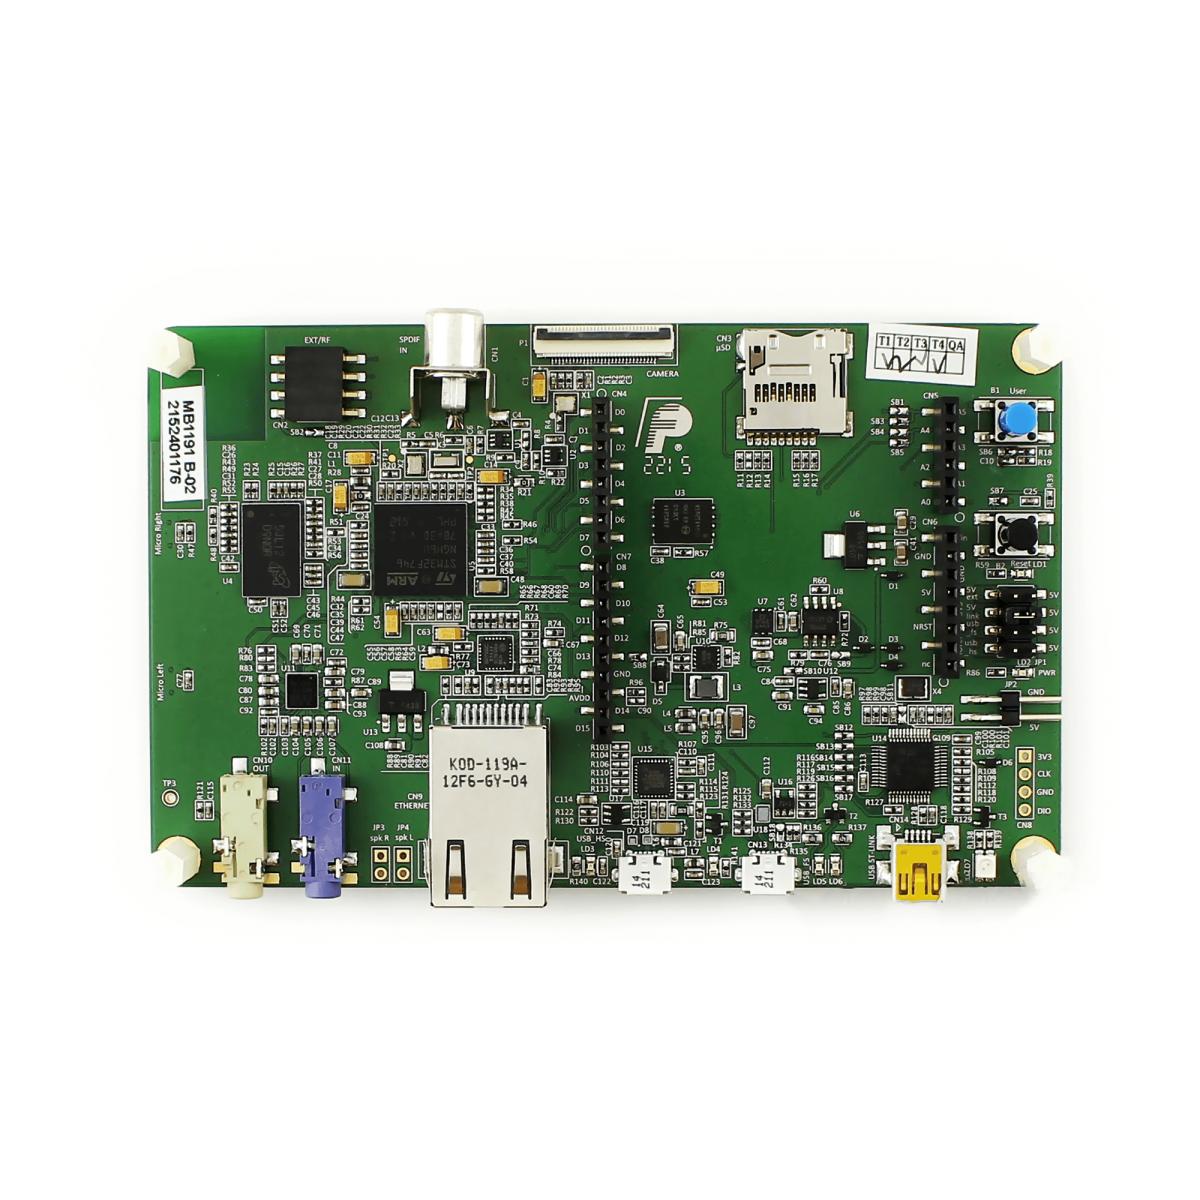 STM32F7 Discovery Kit | Touchscreen DIY Computer | Samm Market